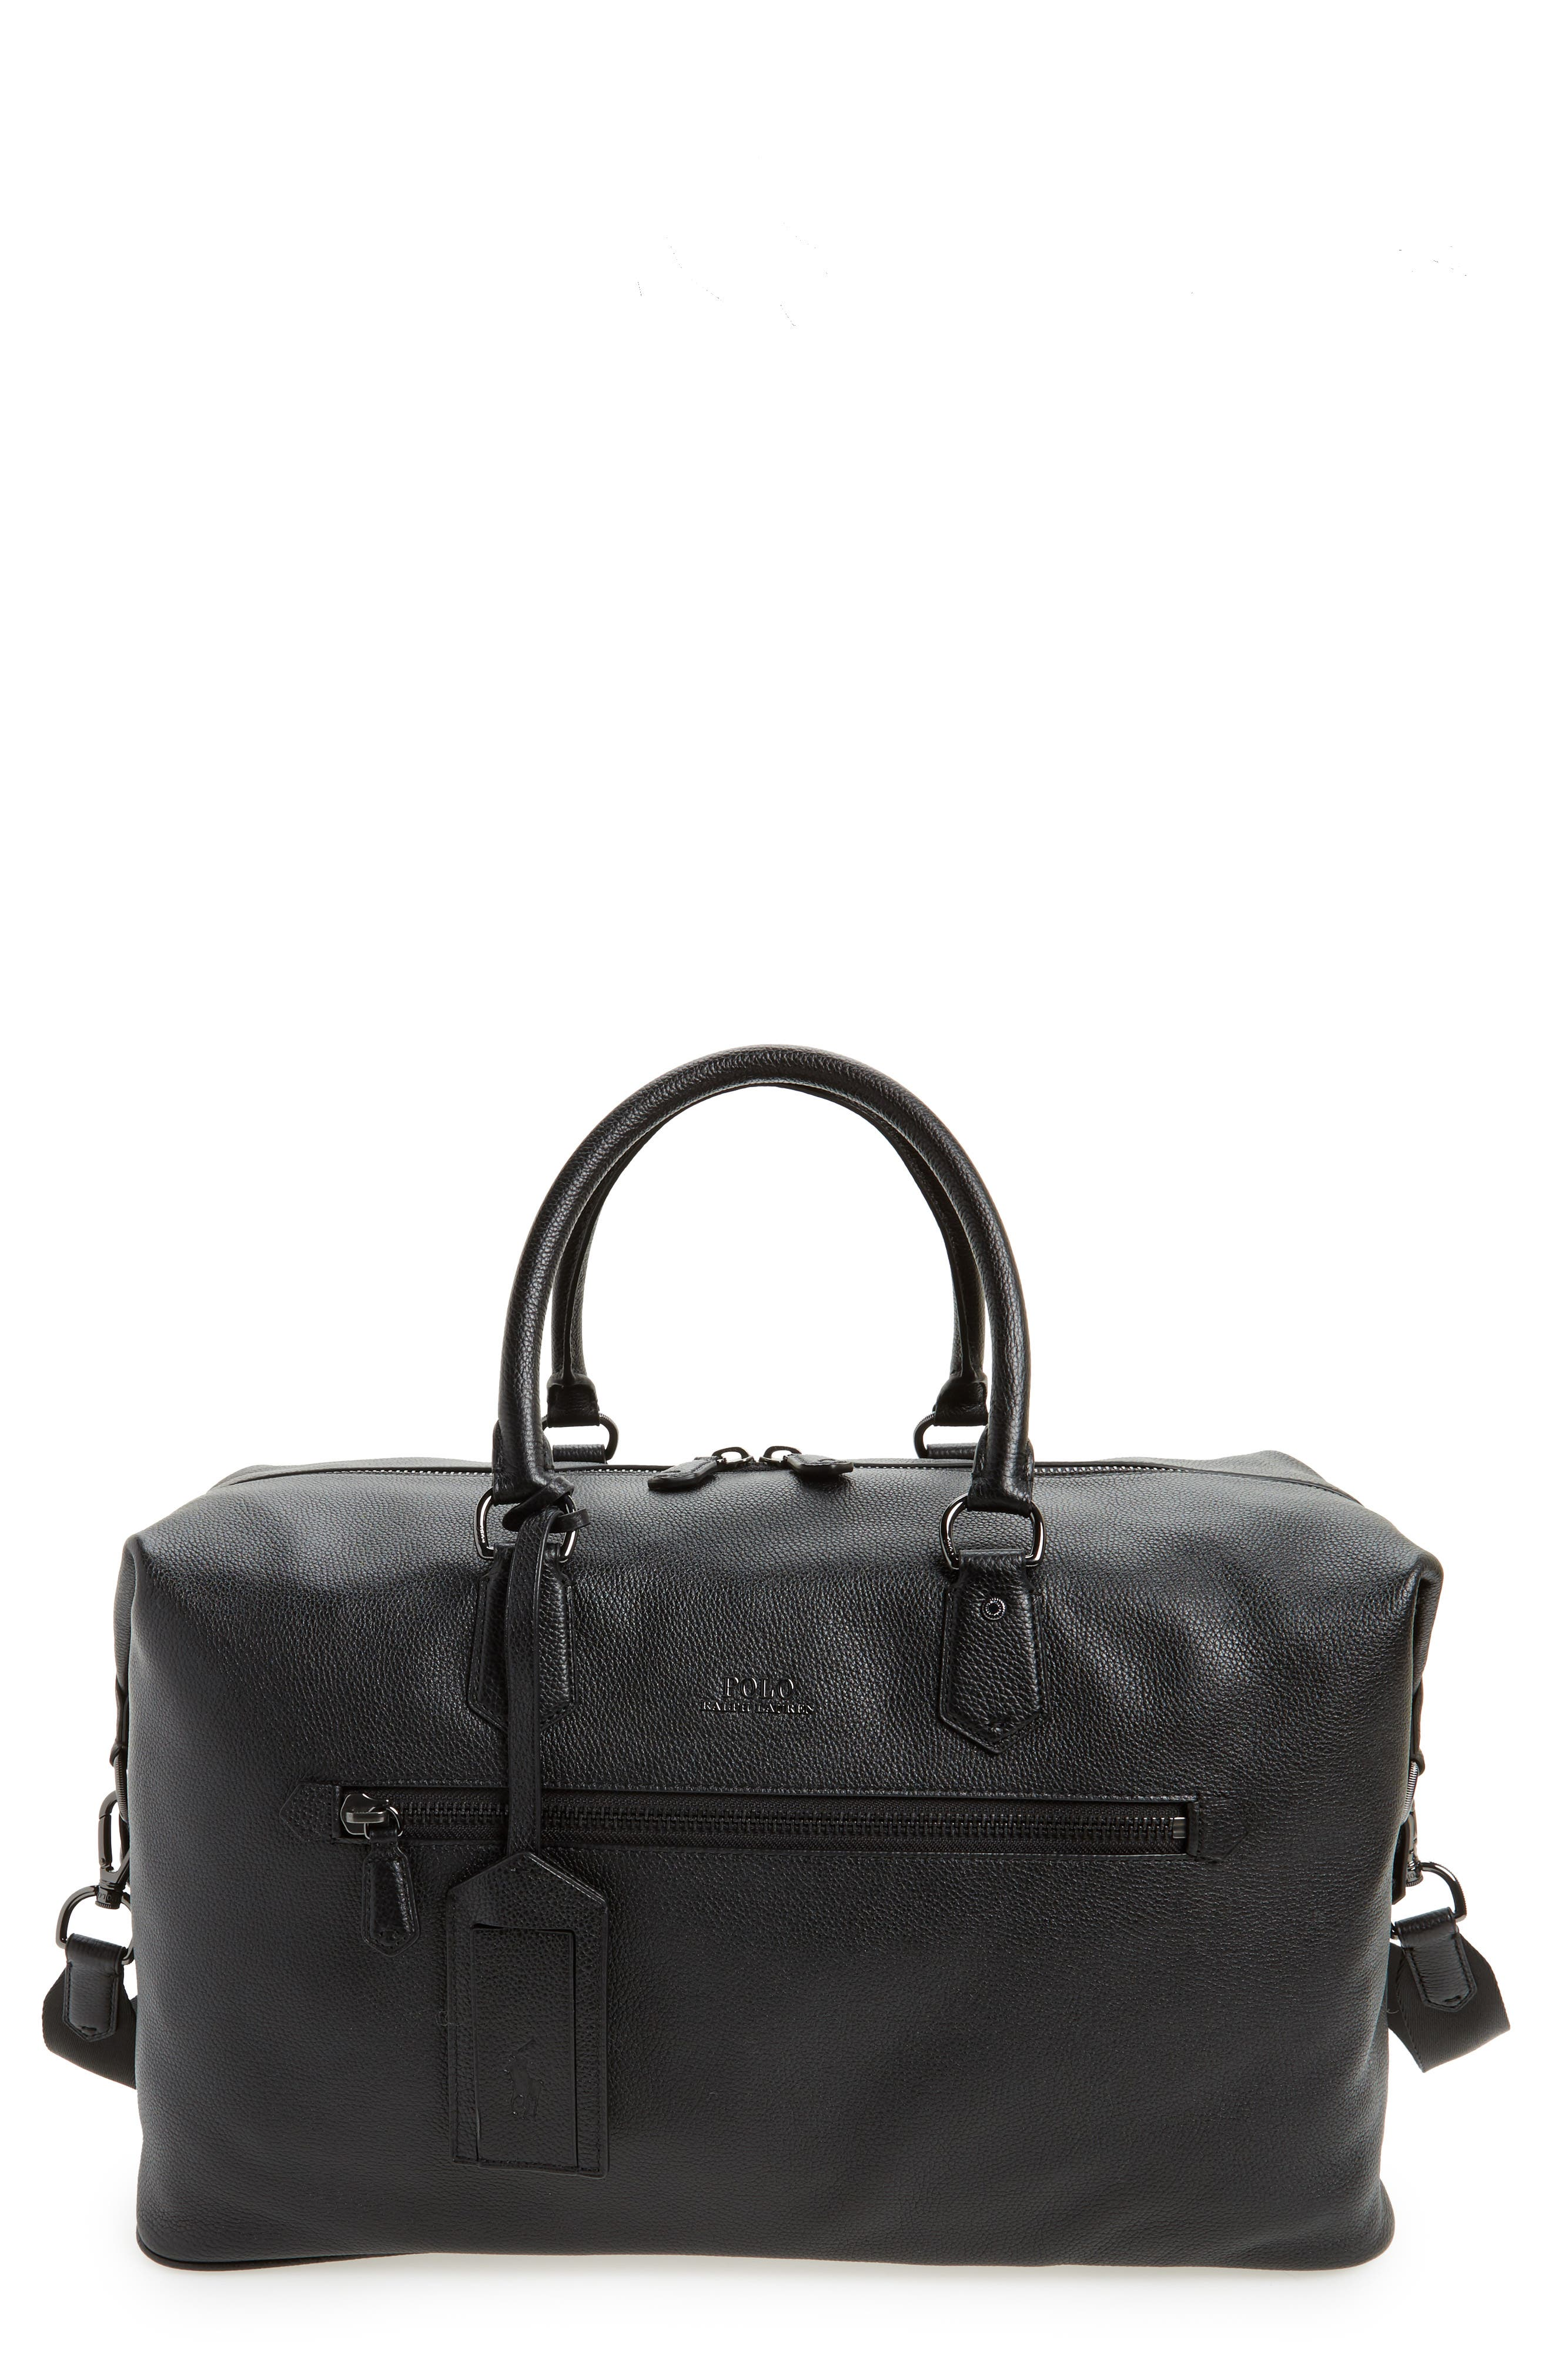 ... cheapest polo ralph lauren pebbled leather duffel bag 67b6c f3d1d ... 5d28f50c3b